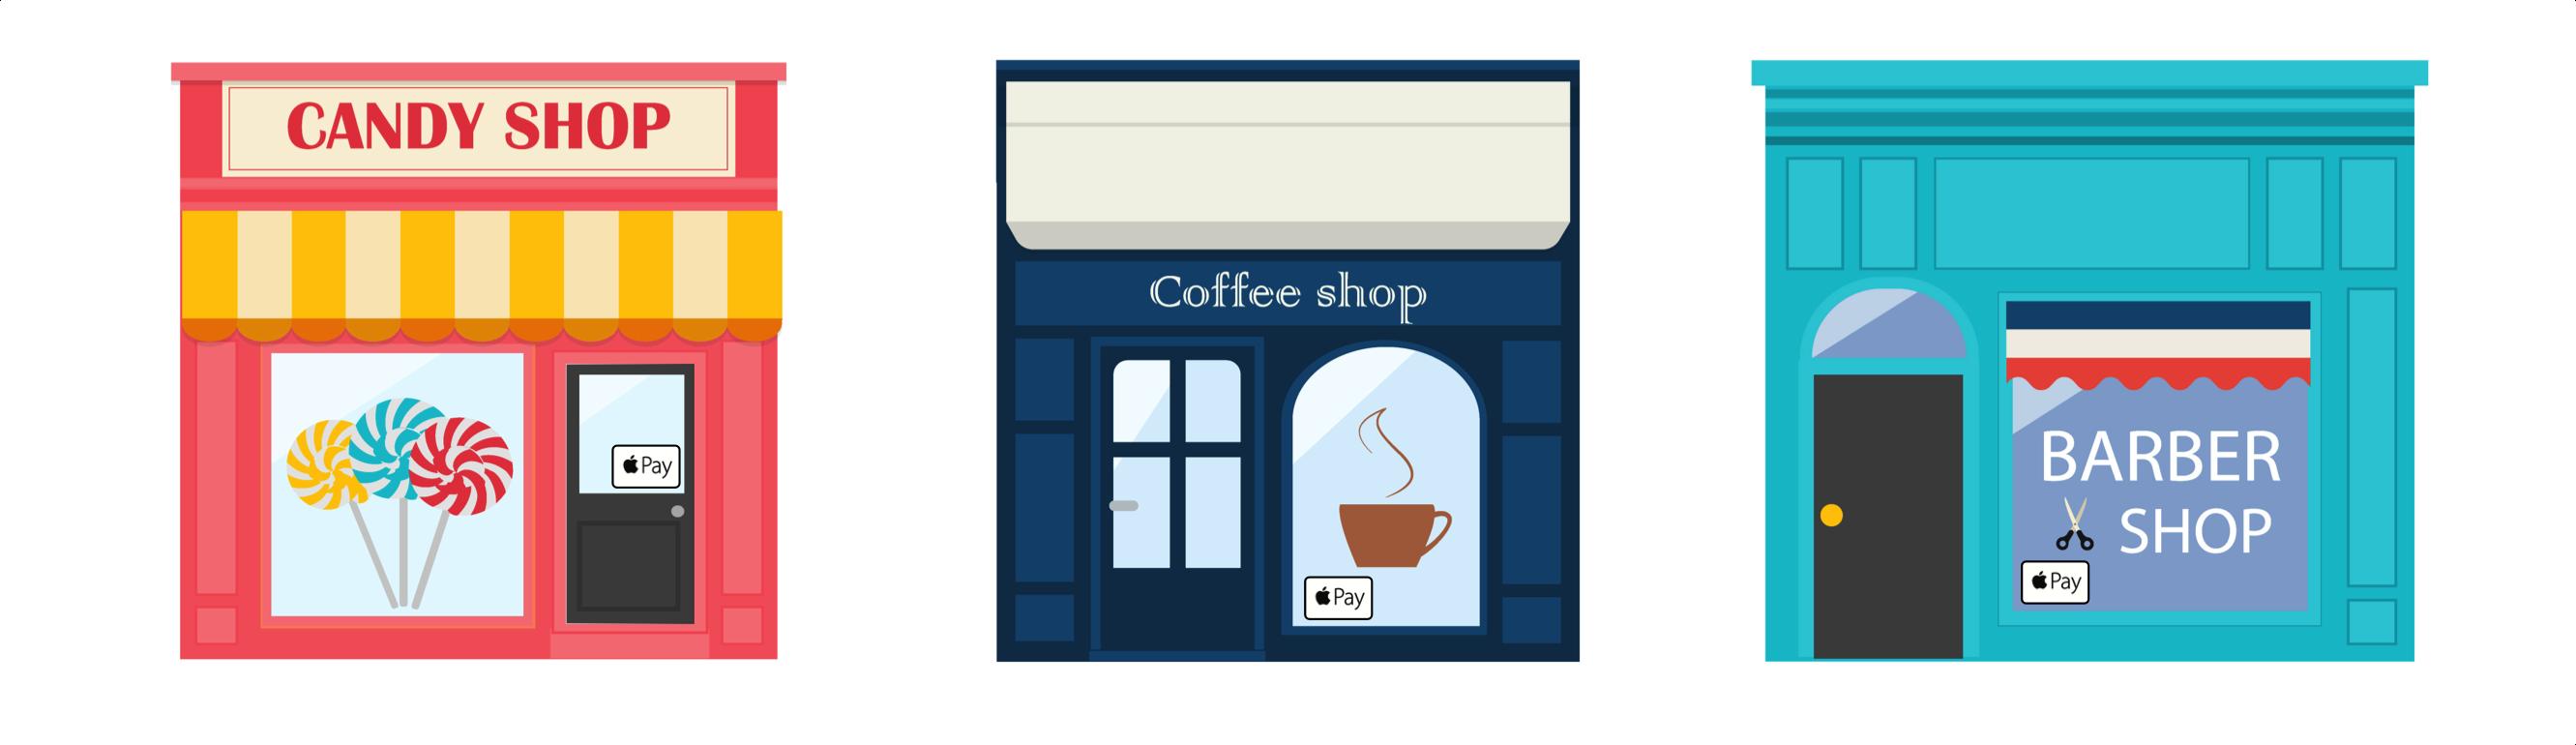 apple-pay-setup-small-business